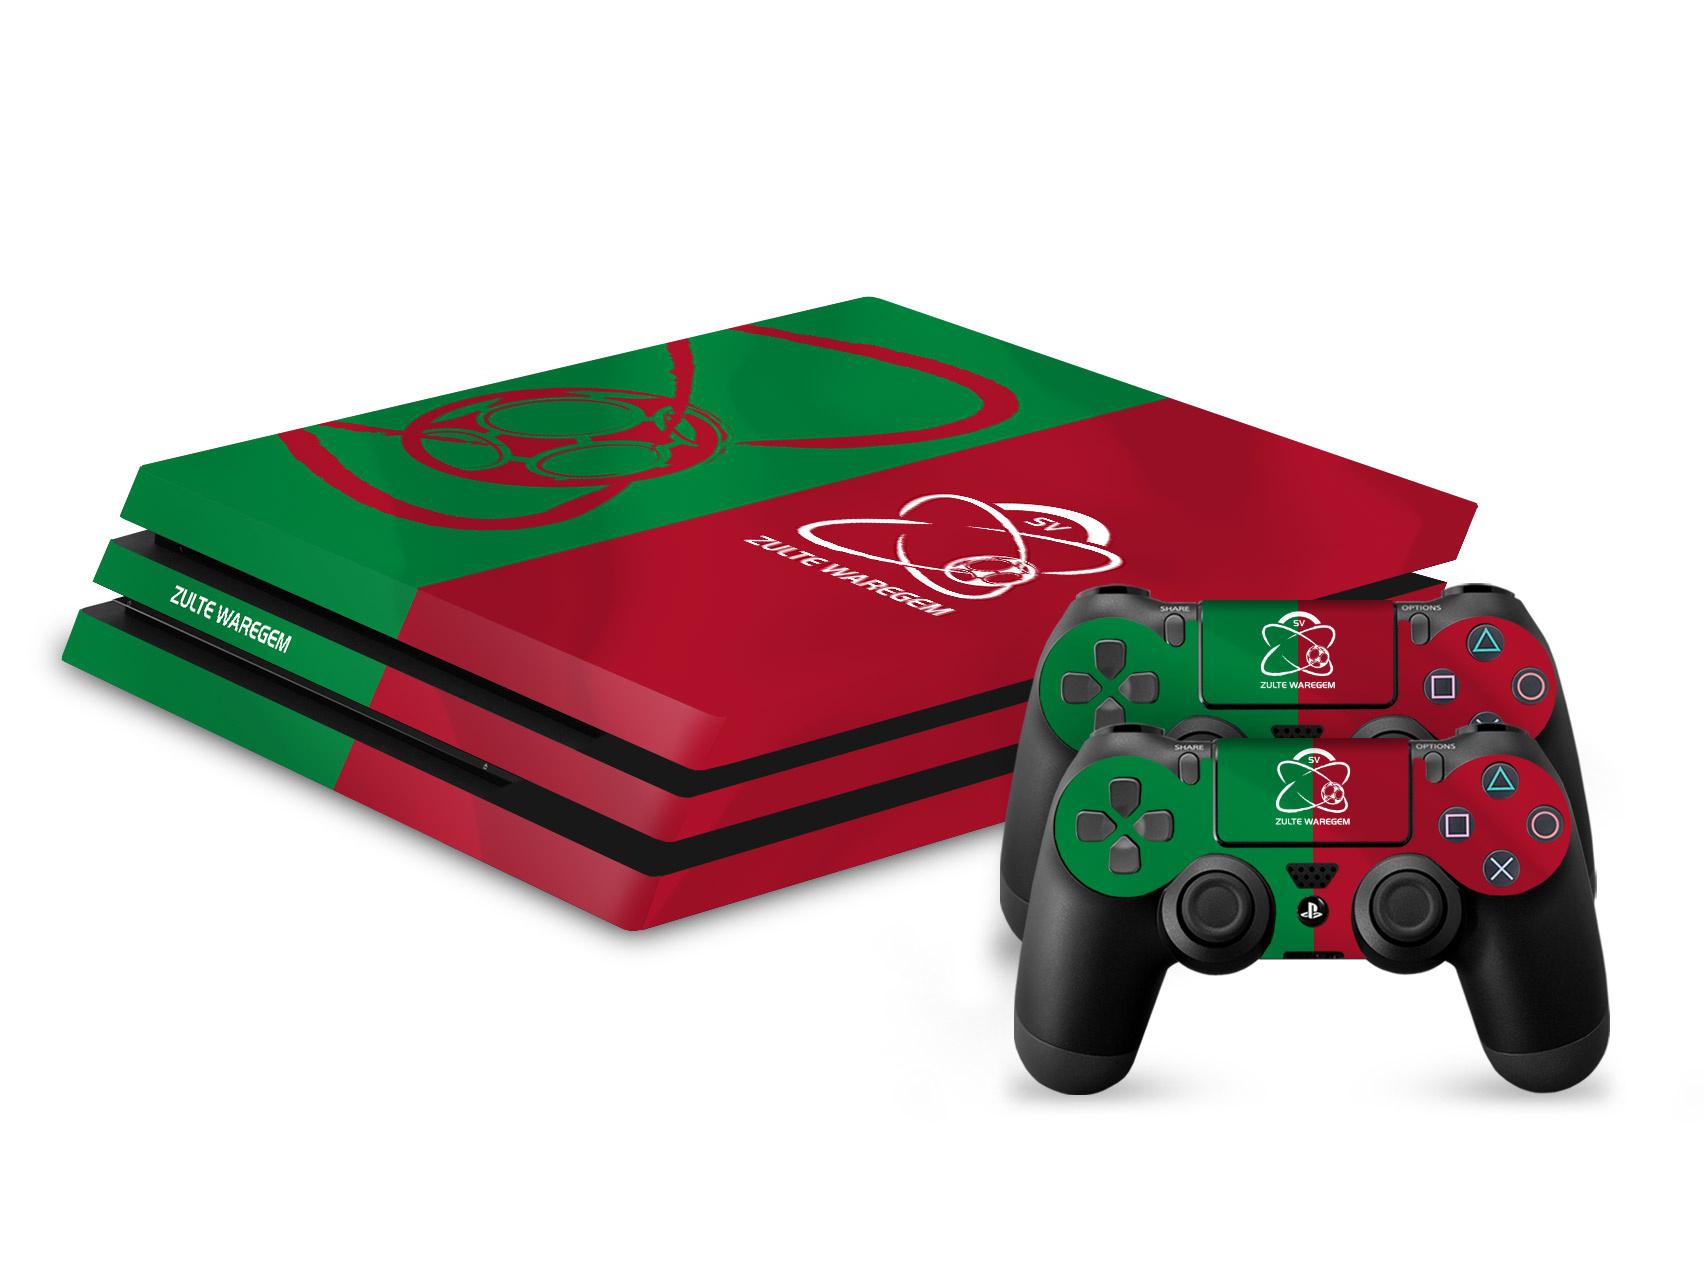 Topfanz Console Skin PS4 Pro - Zulte Waregem